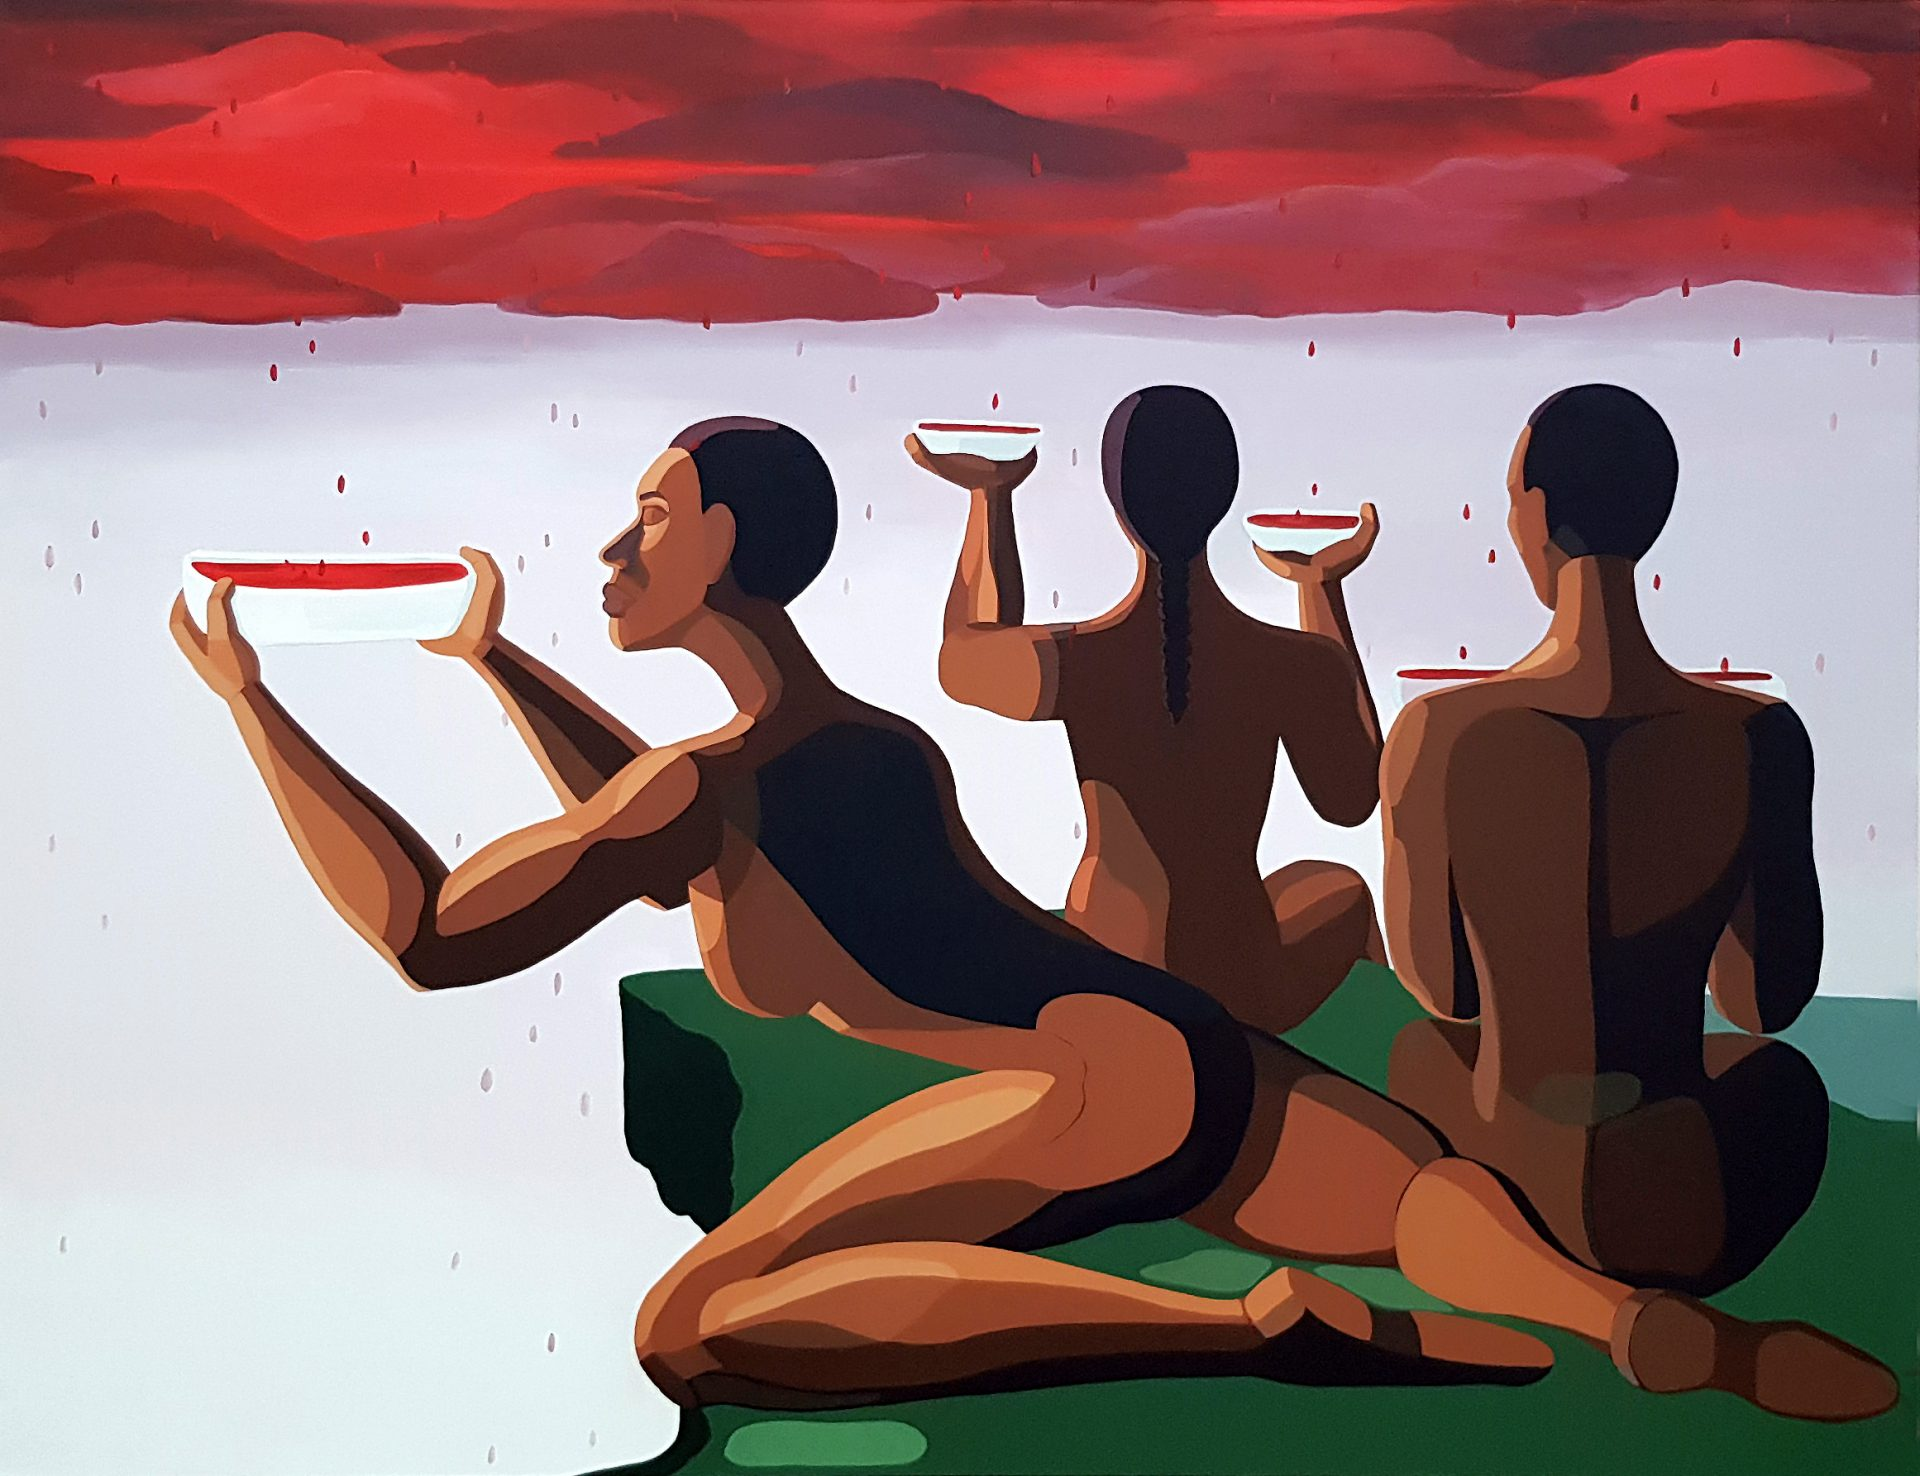 Nirit Takele, Our donation blod, 2018, acrylic on canvas, 165x210 cm